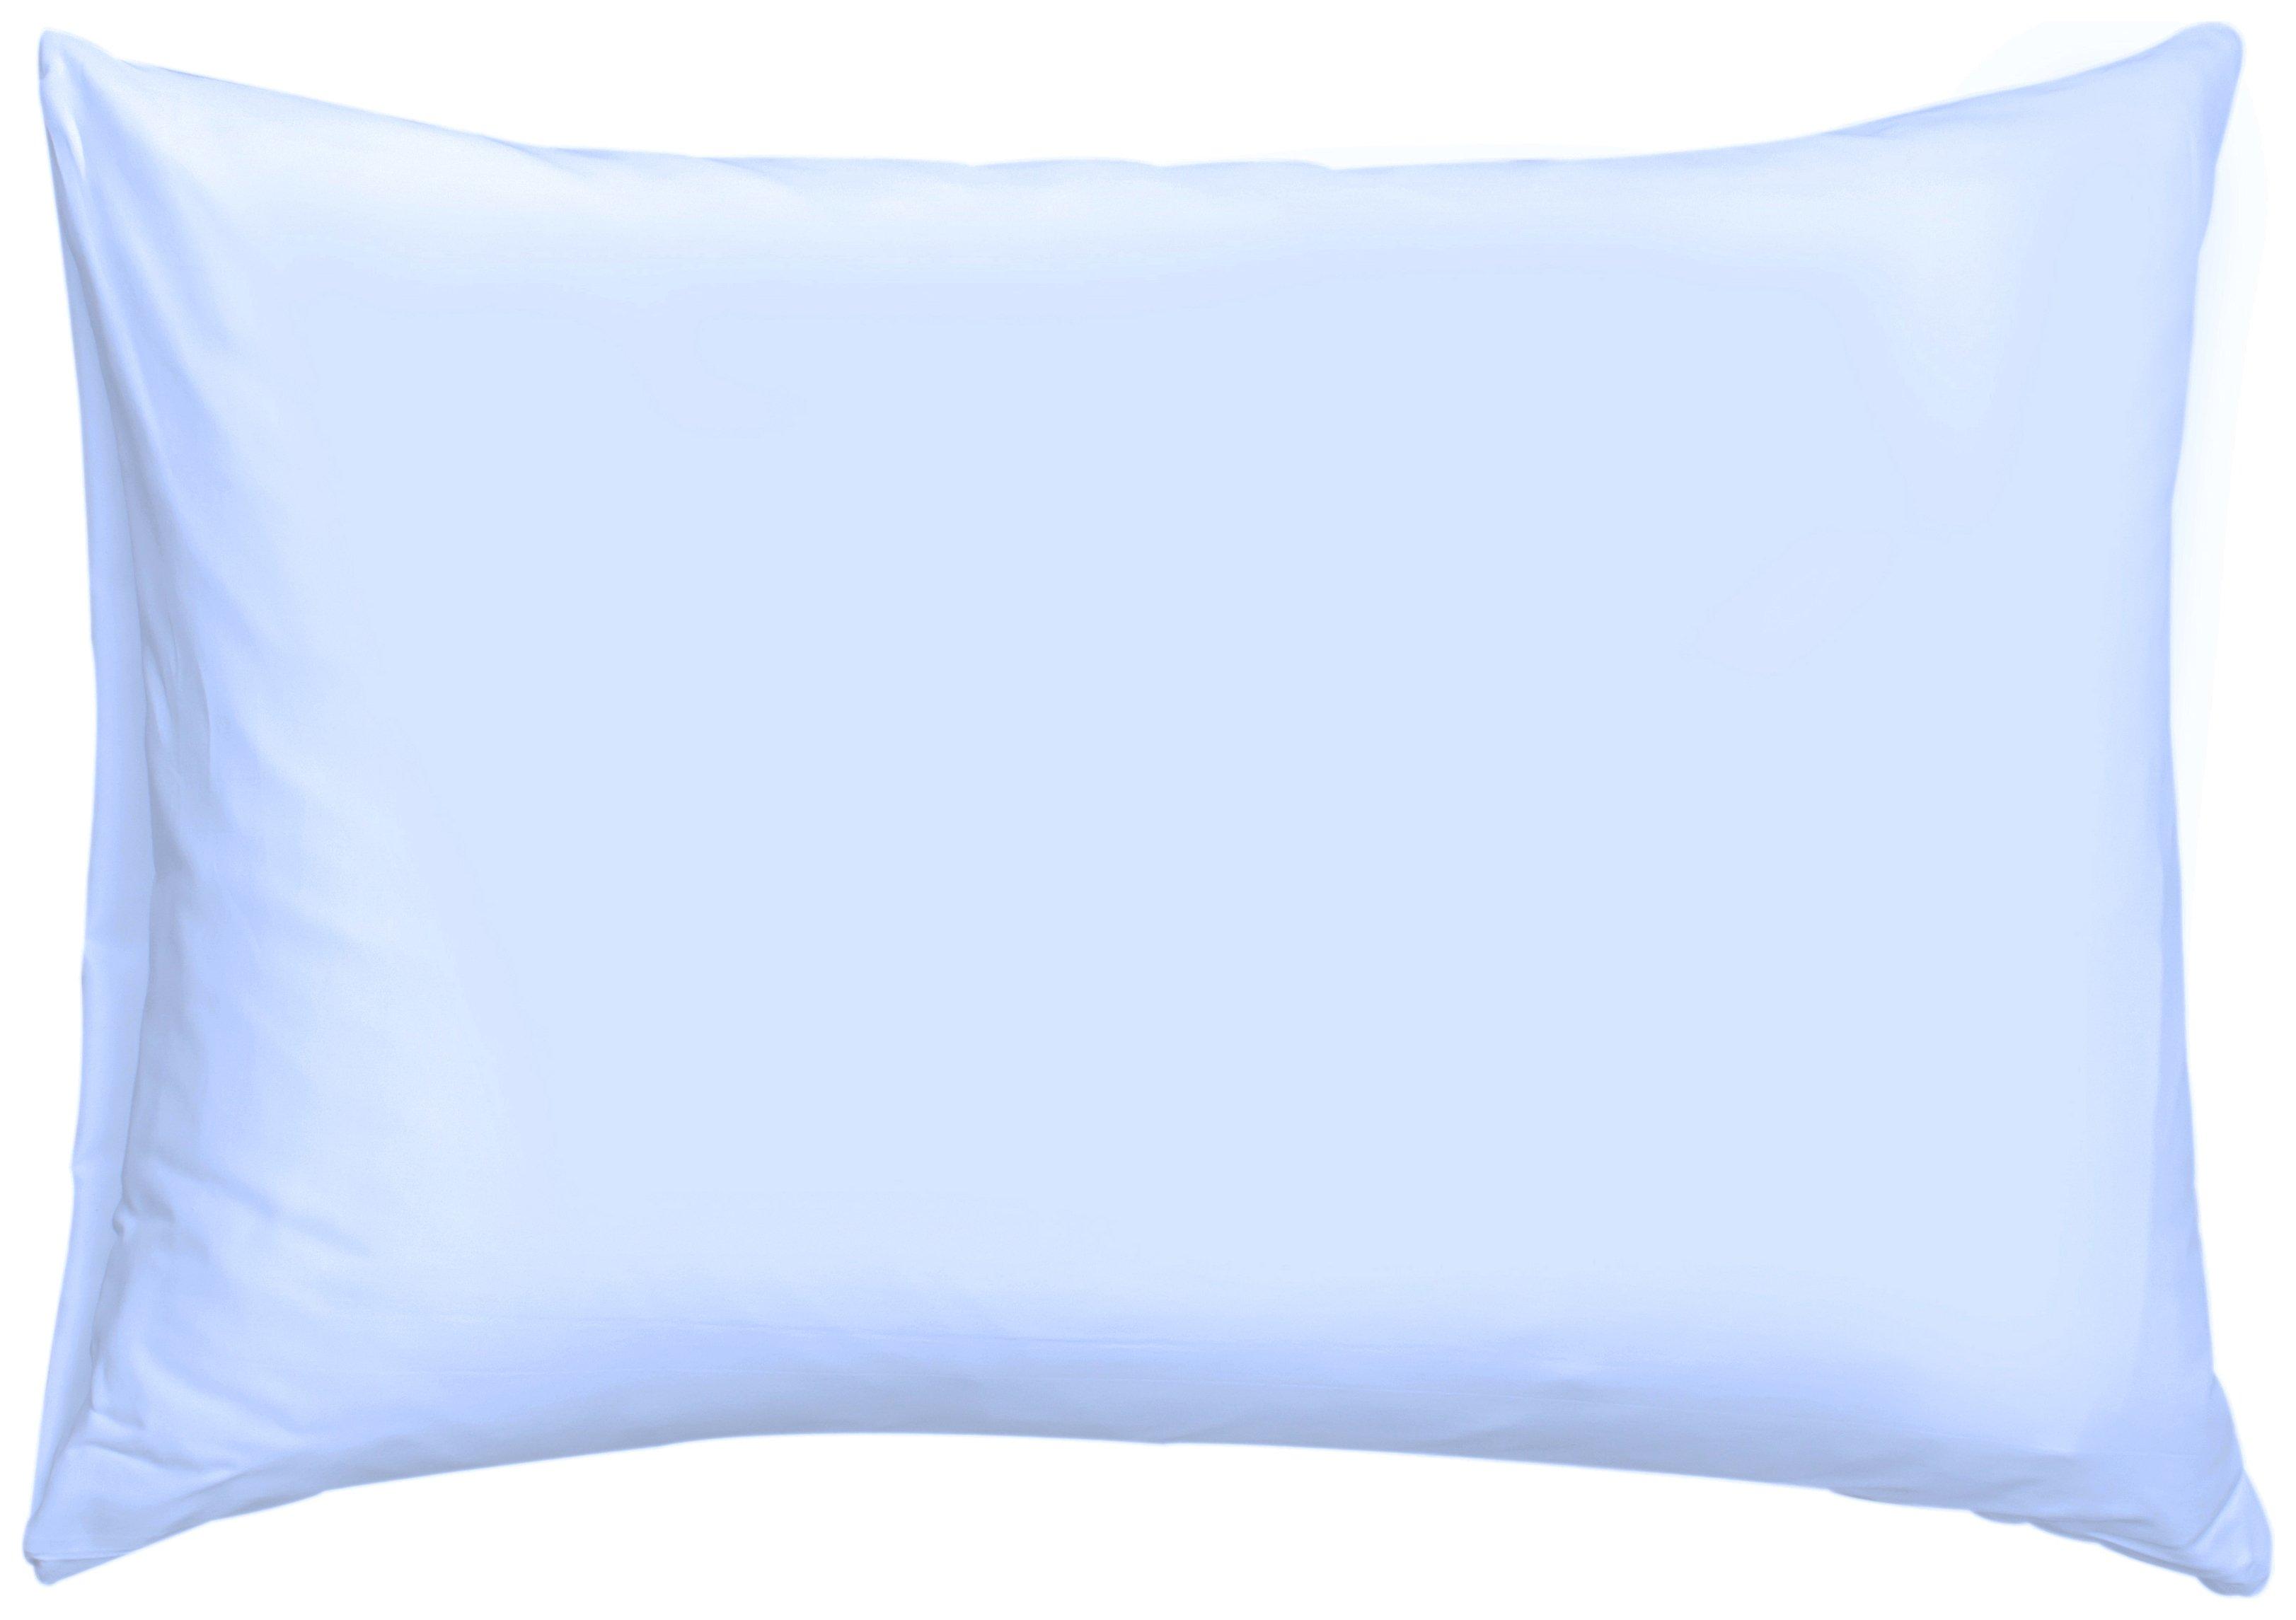 downland  blue kingsize pillowcases  set of 2